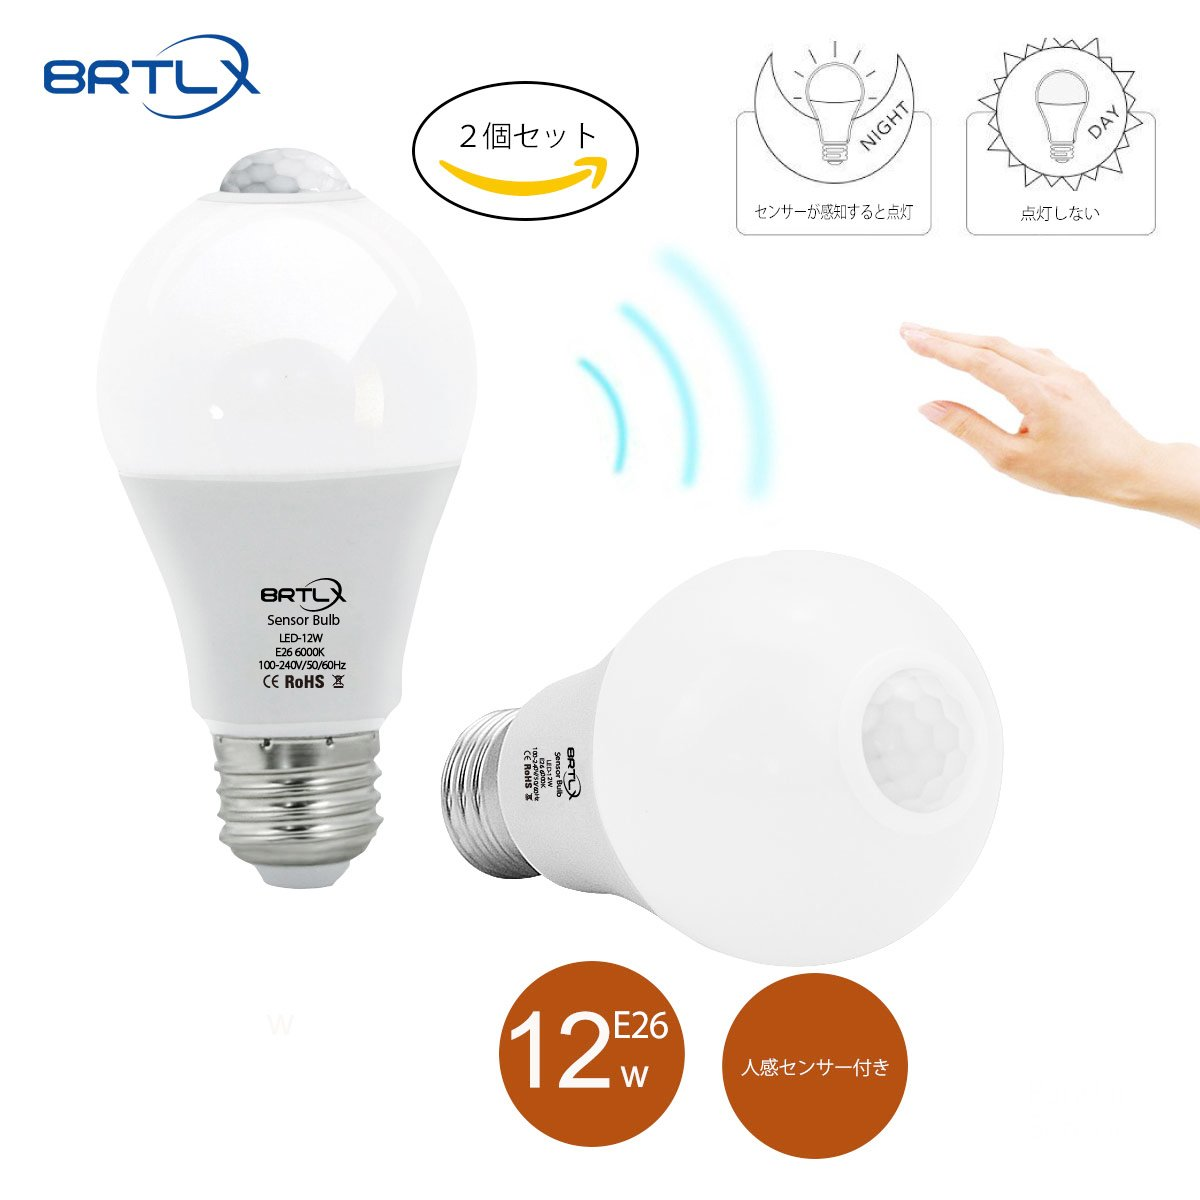 BRTLX 改良版LED電球 人感センサー付 12W E26口金 100W形相当 6000k2個パック 自動点灯 消灯 昼白色 広配光タイプ 室内センサーライト